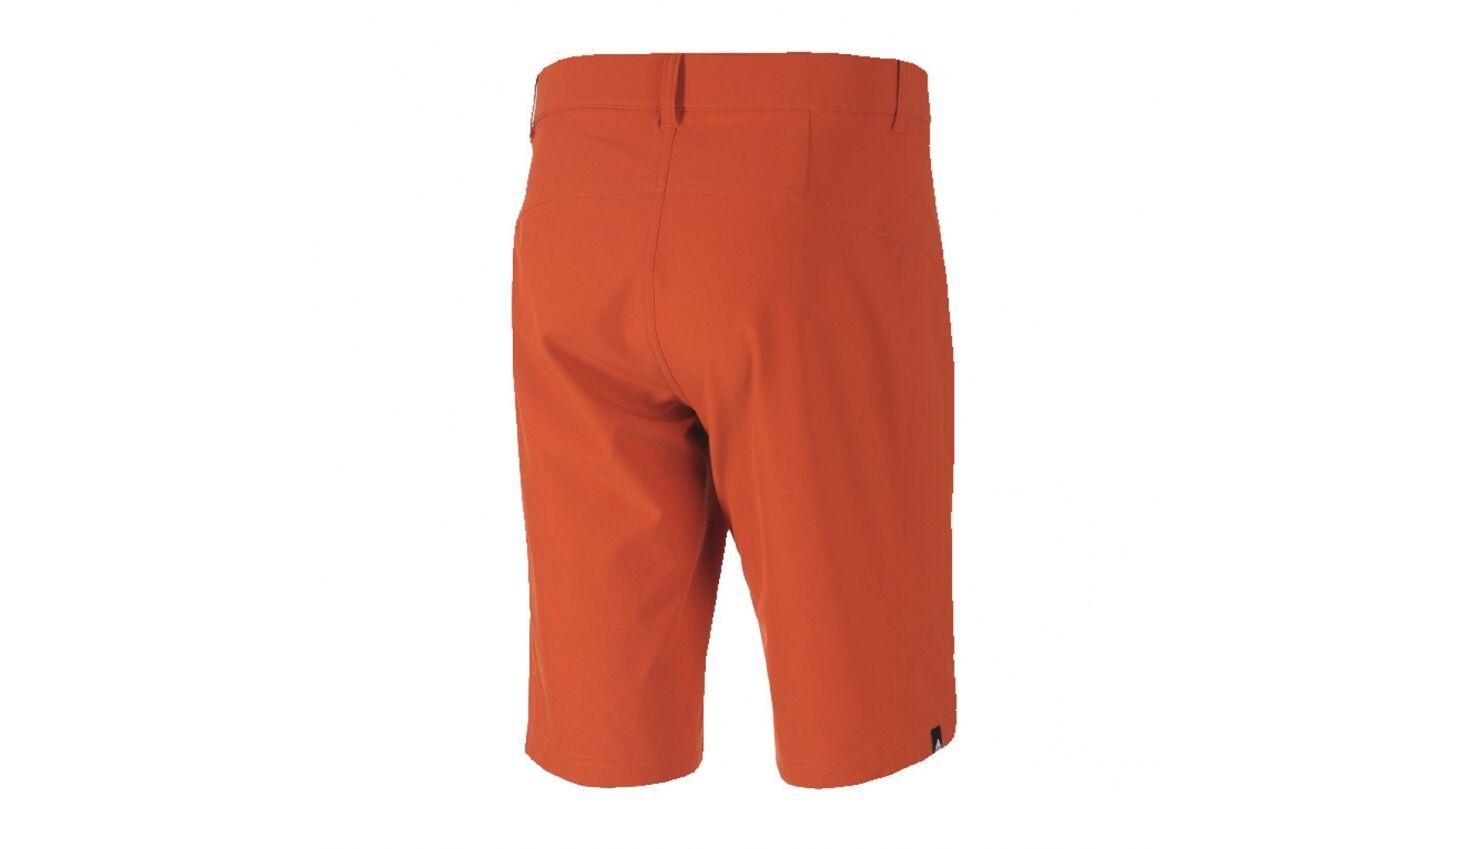 ADIDAS Uomo Short Short Short Bermuda Pantaloni Funzionali HT Summer 4 vie stretch leggermente guarda 63f272